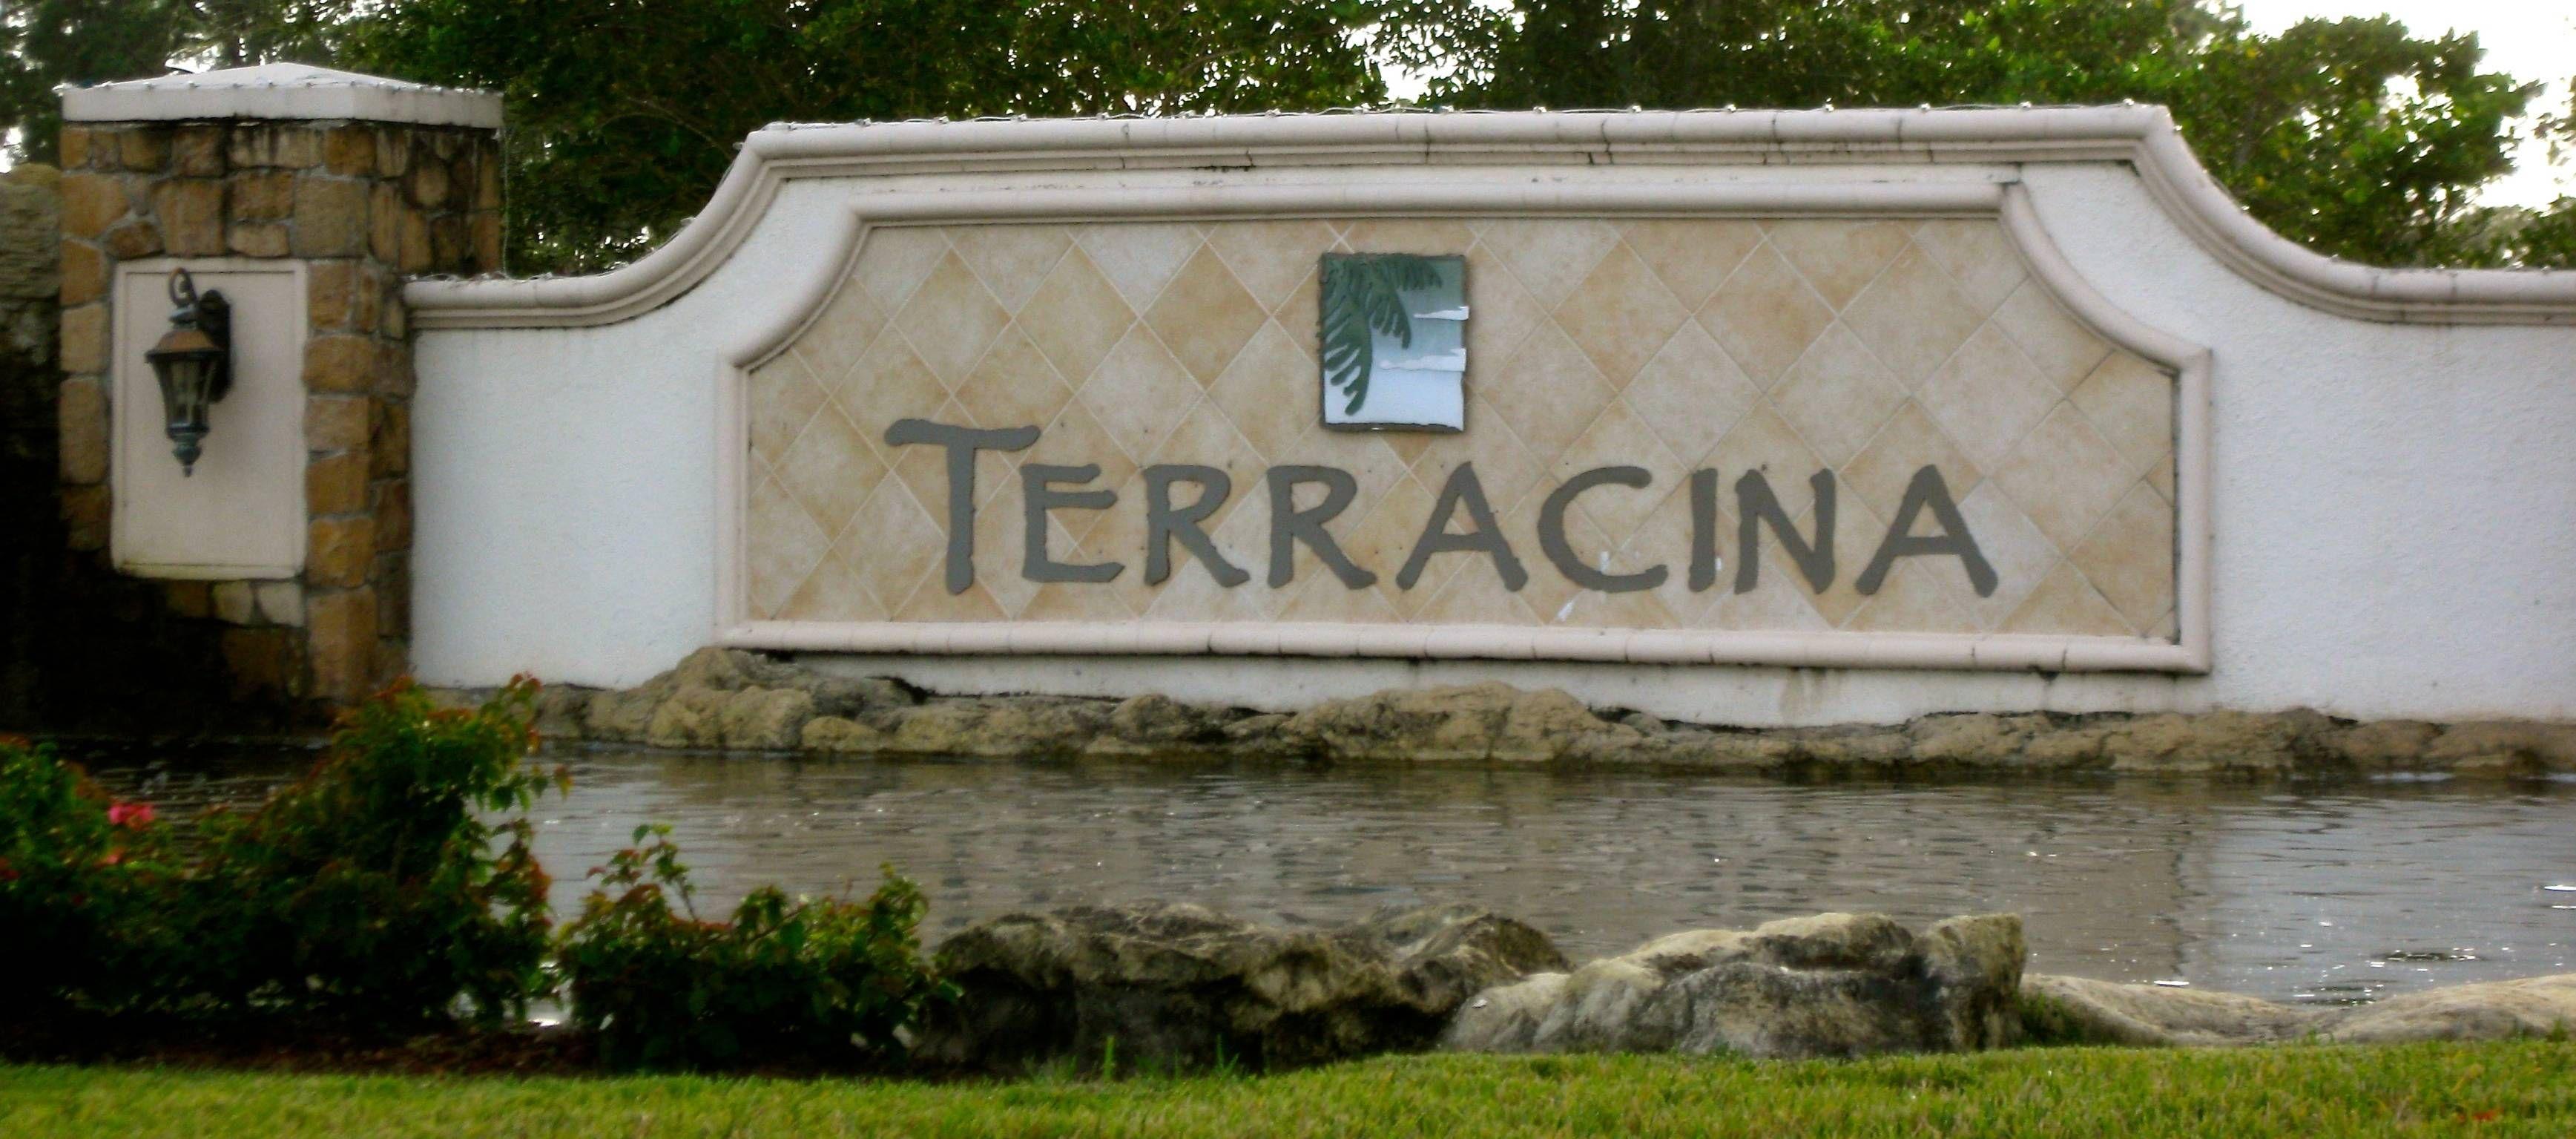 Video Terracina West Palm Beach Fl Homes For Sale West Palm Beach Palm Beach Fl West Palm